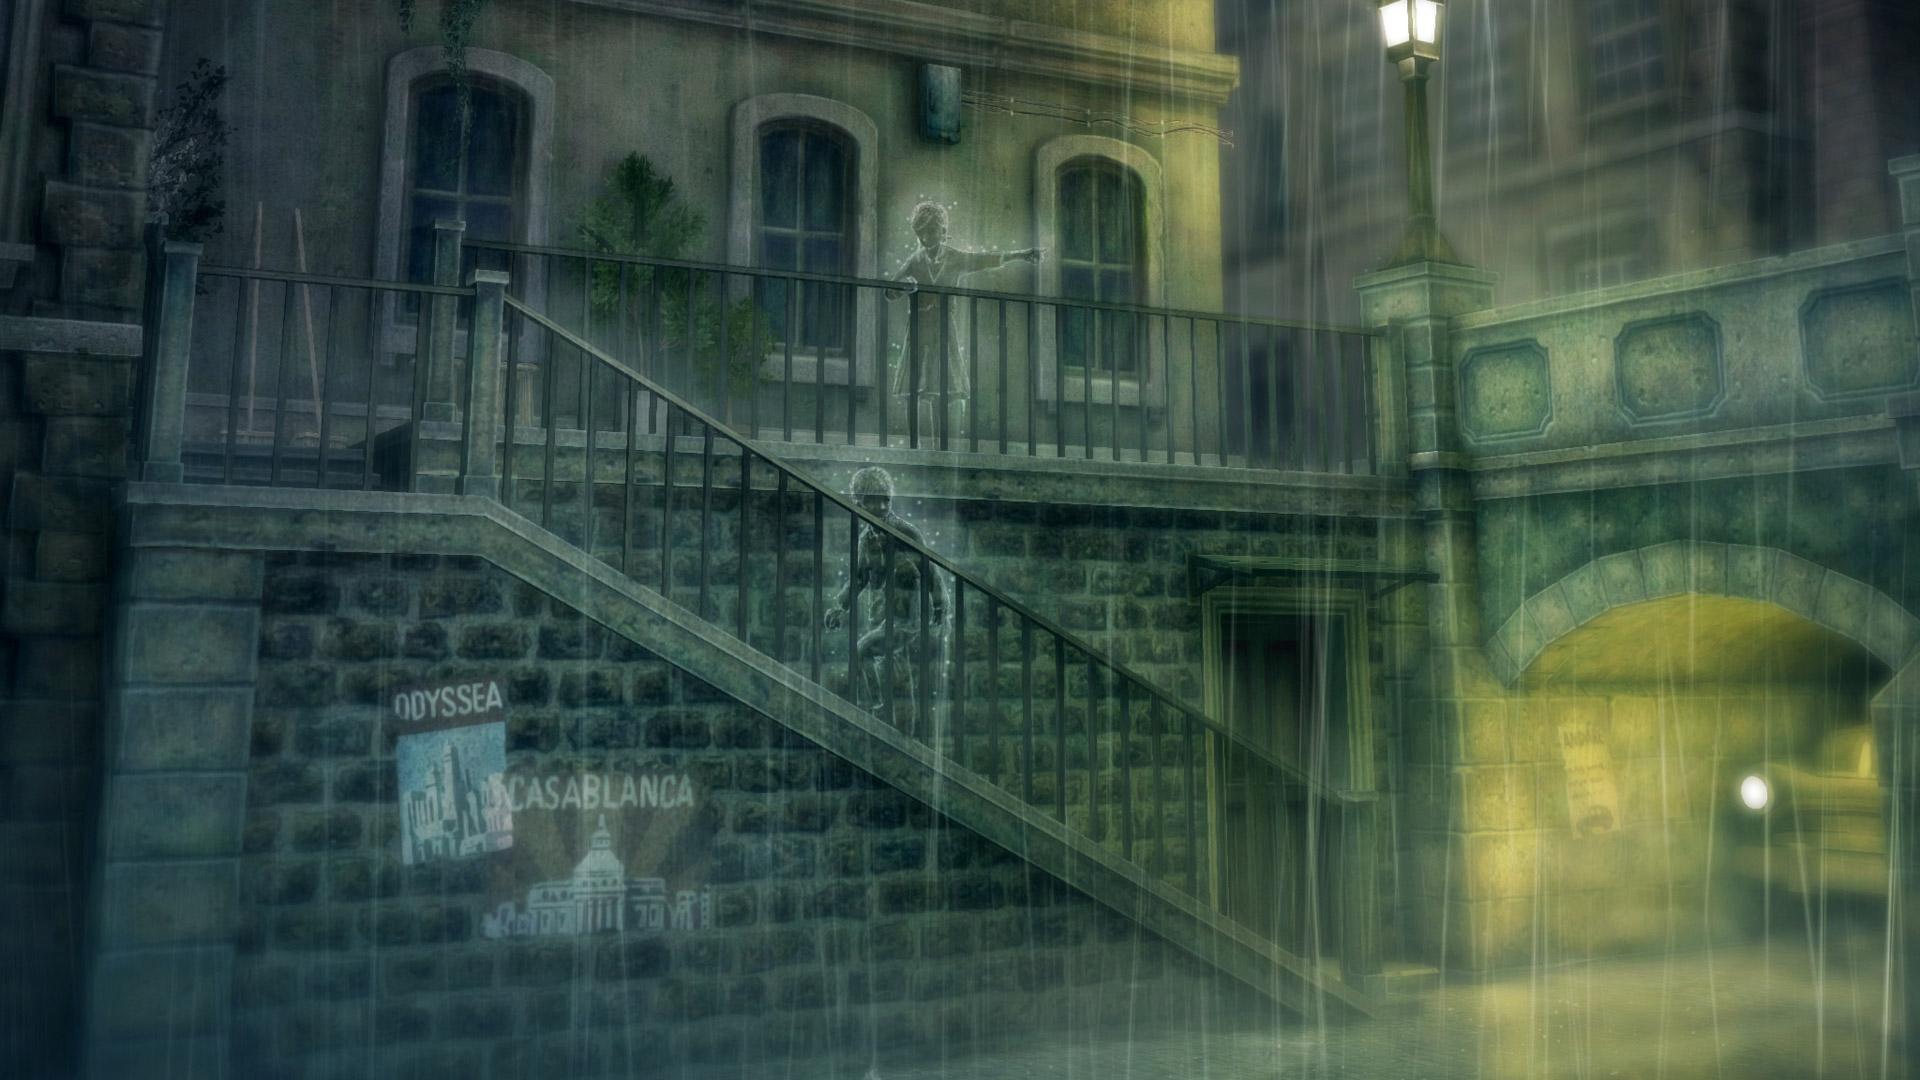 Rain wallpaper 4